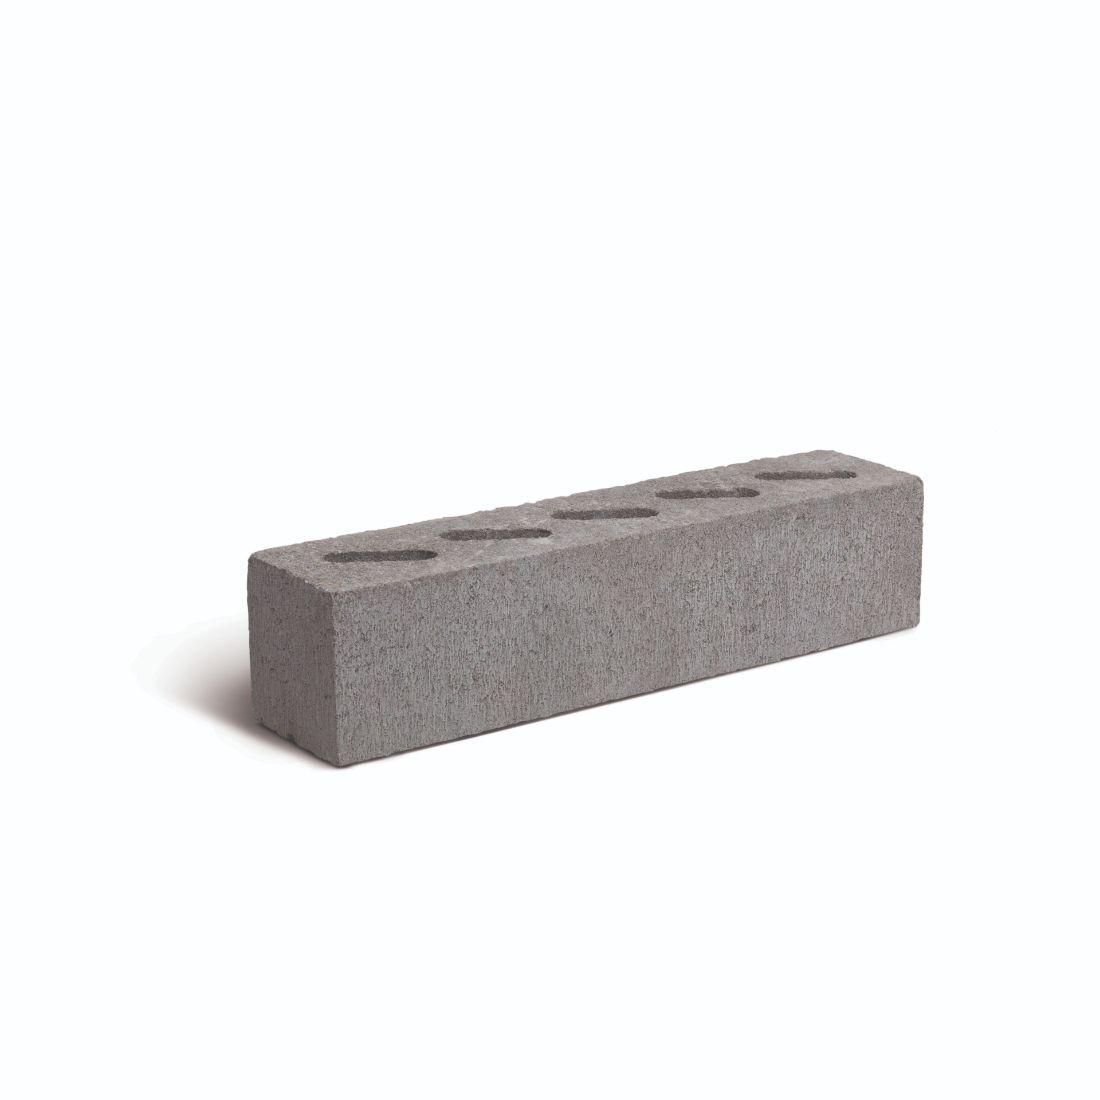 H10.01 Standard Whole Half High Block 390 x 90 x 90mm